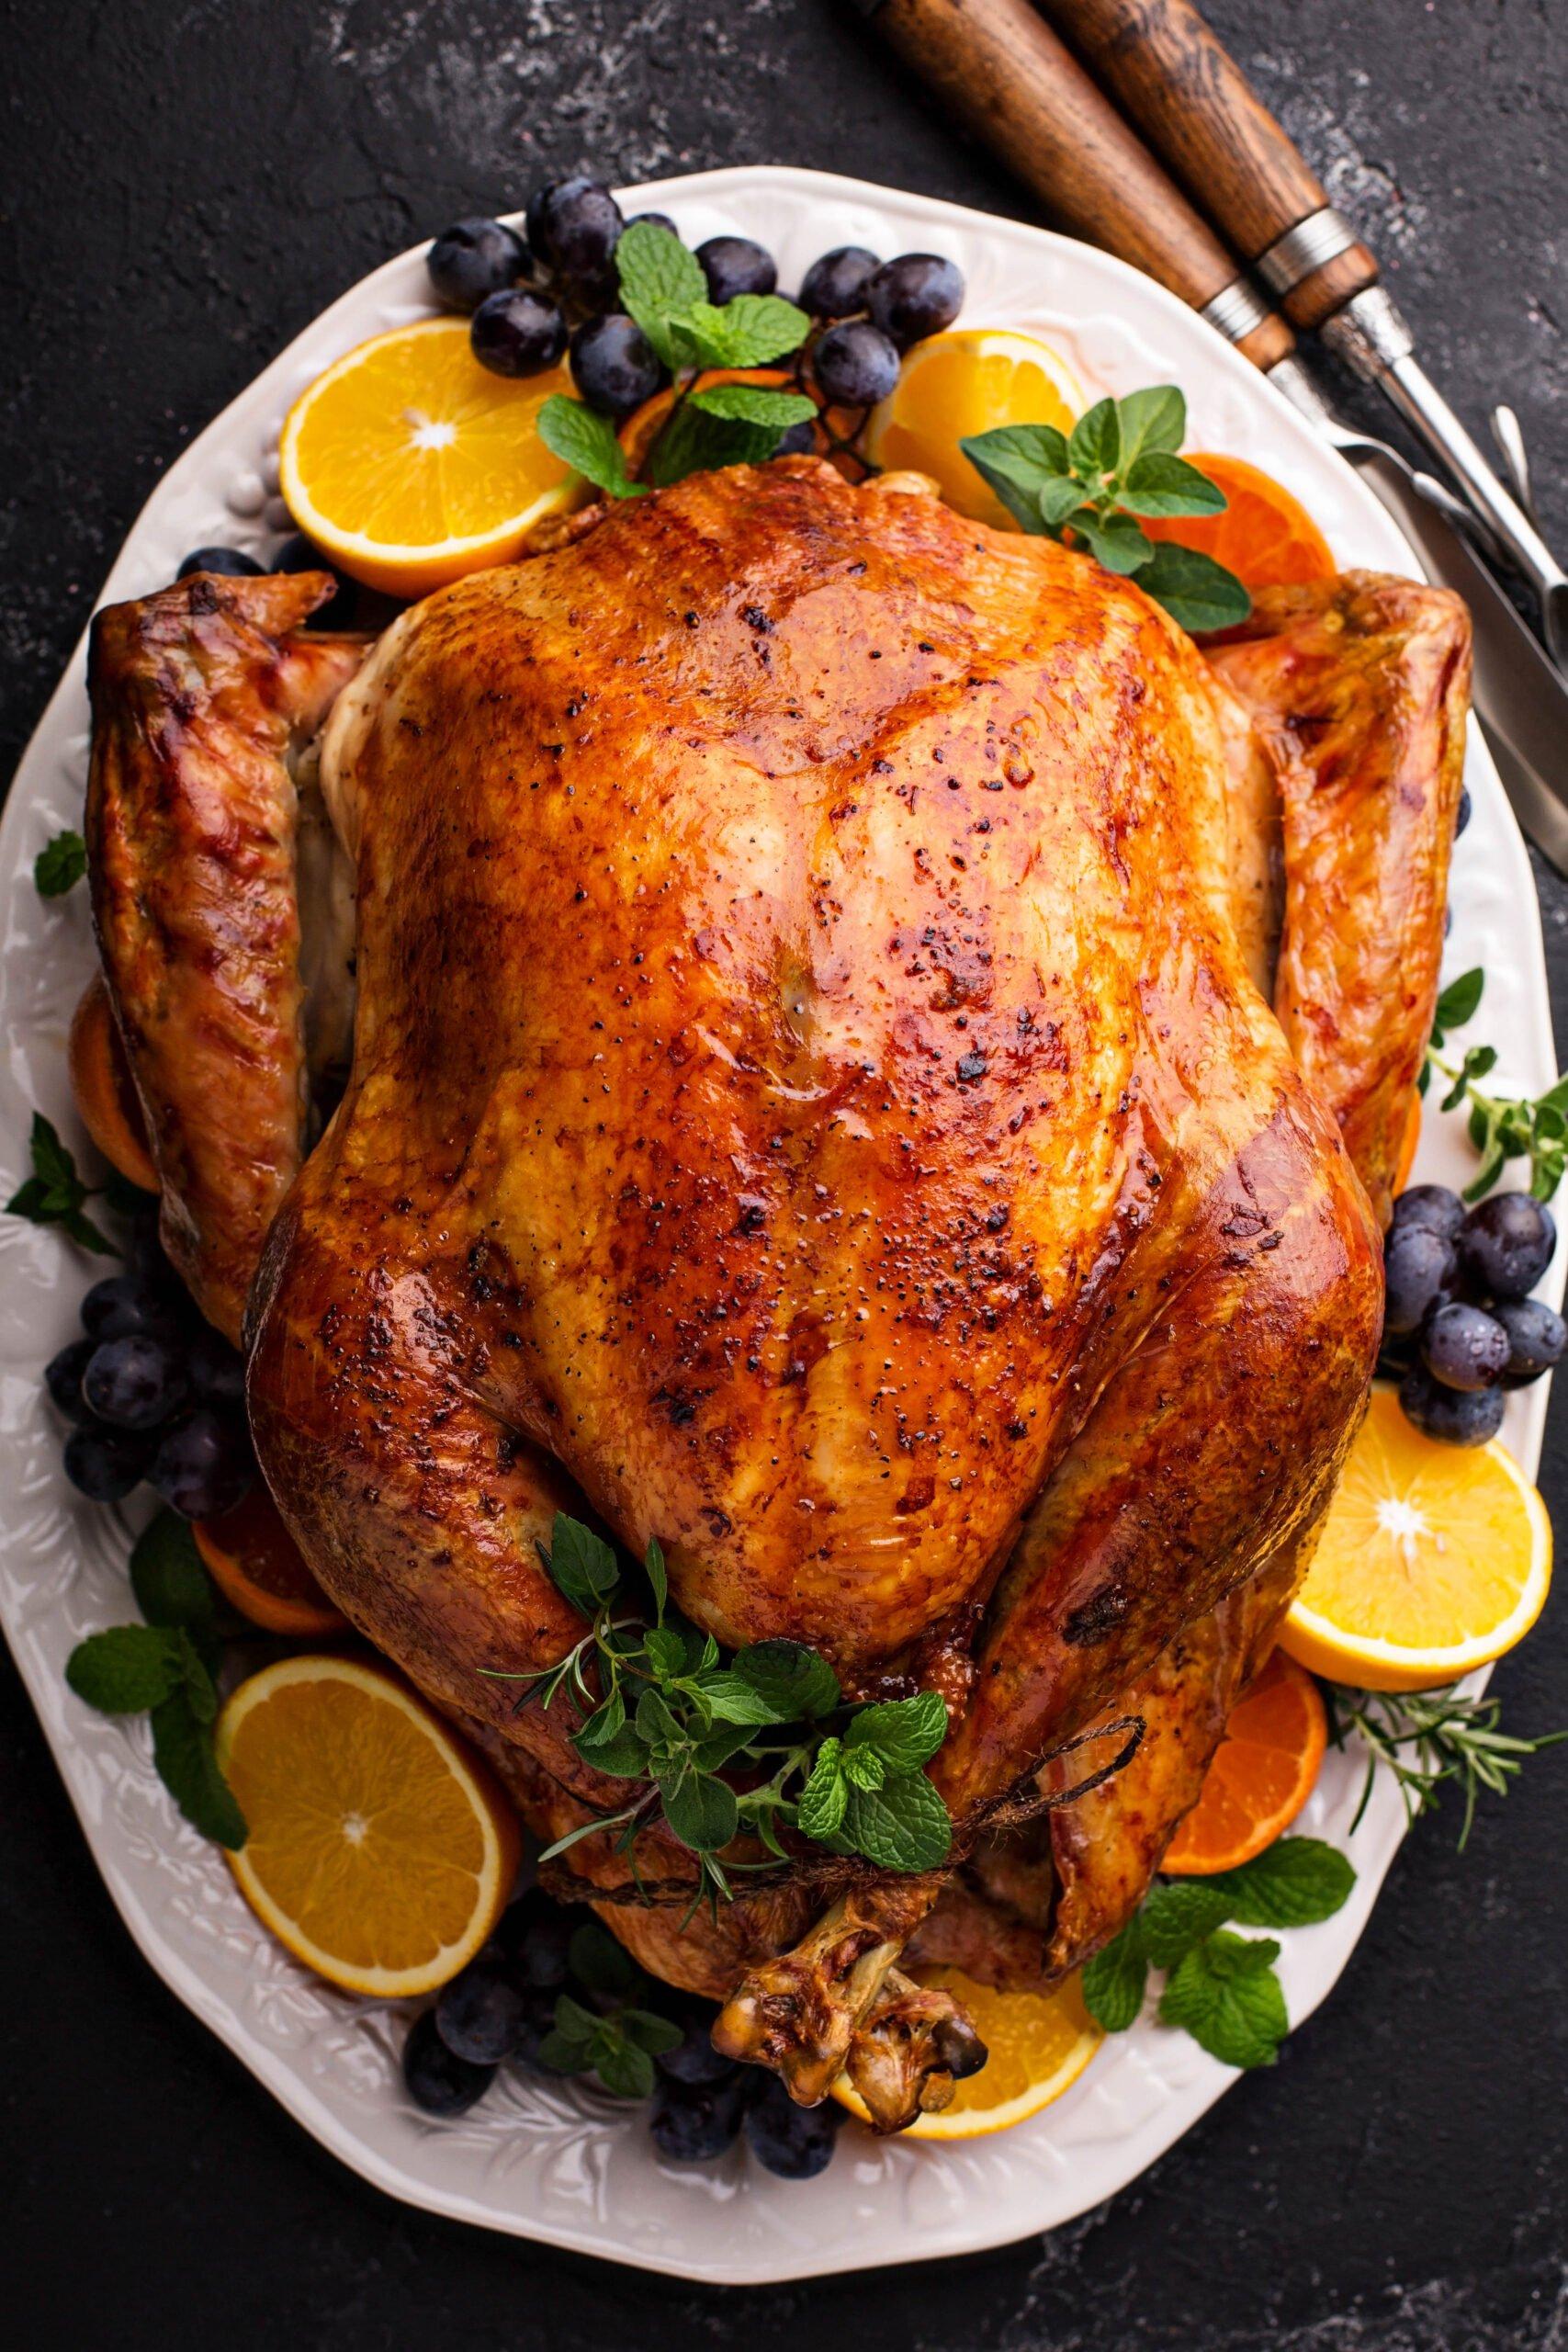 Roast turkey on a platter for Thanksgiving turkey.